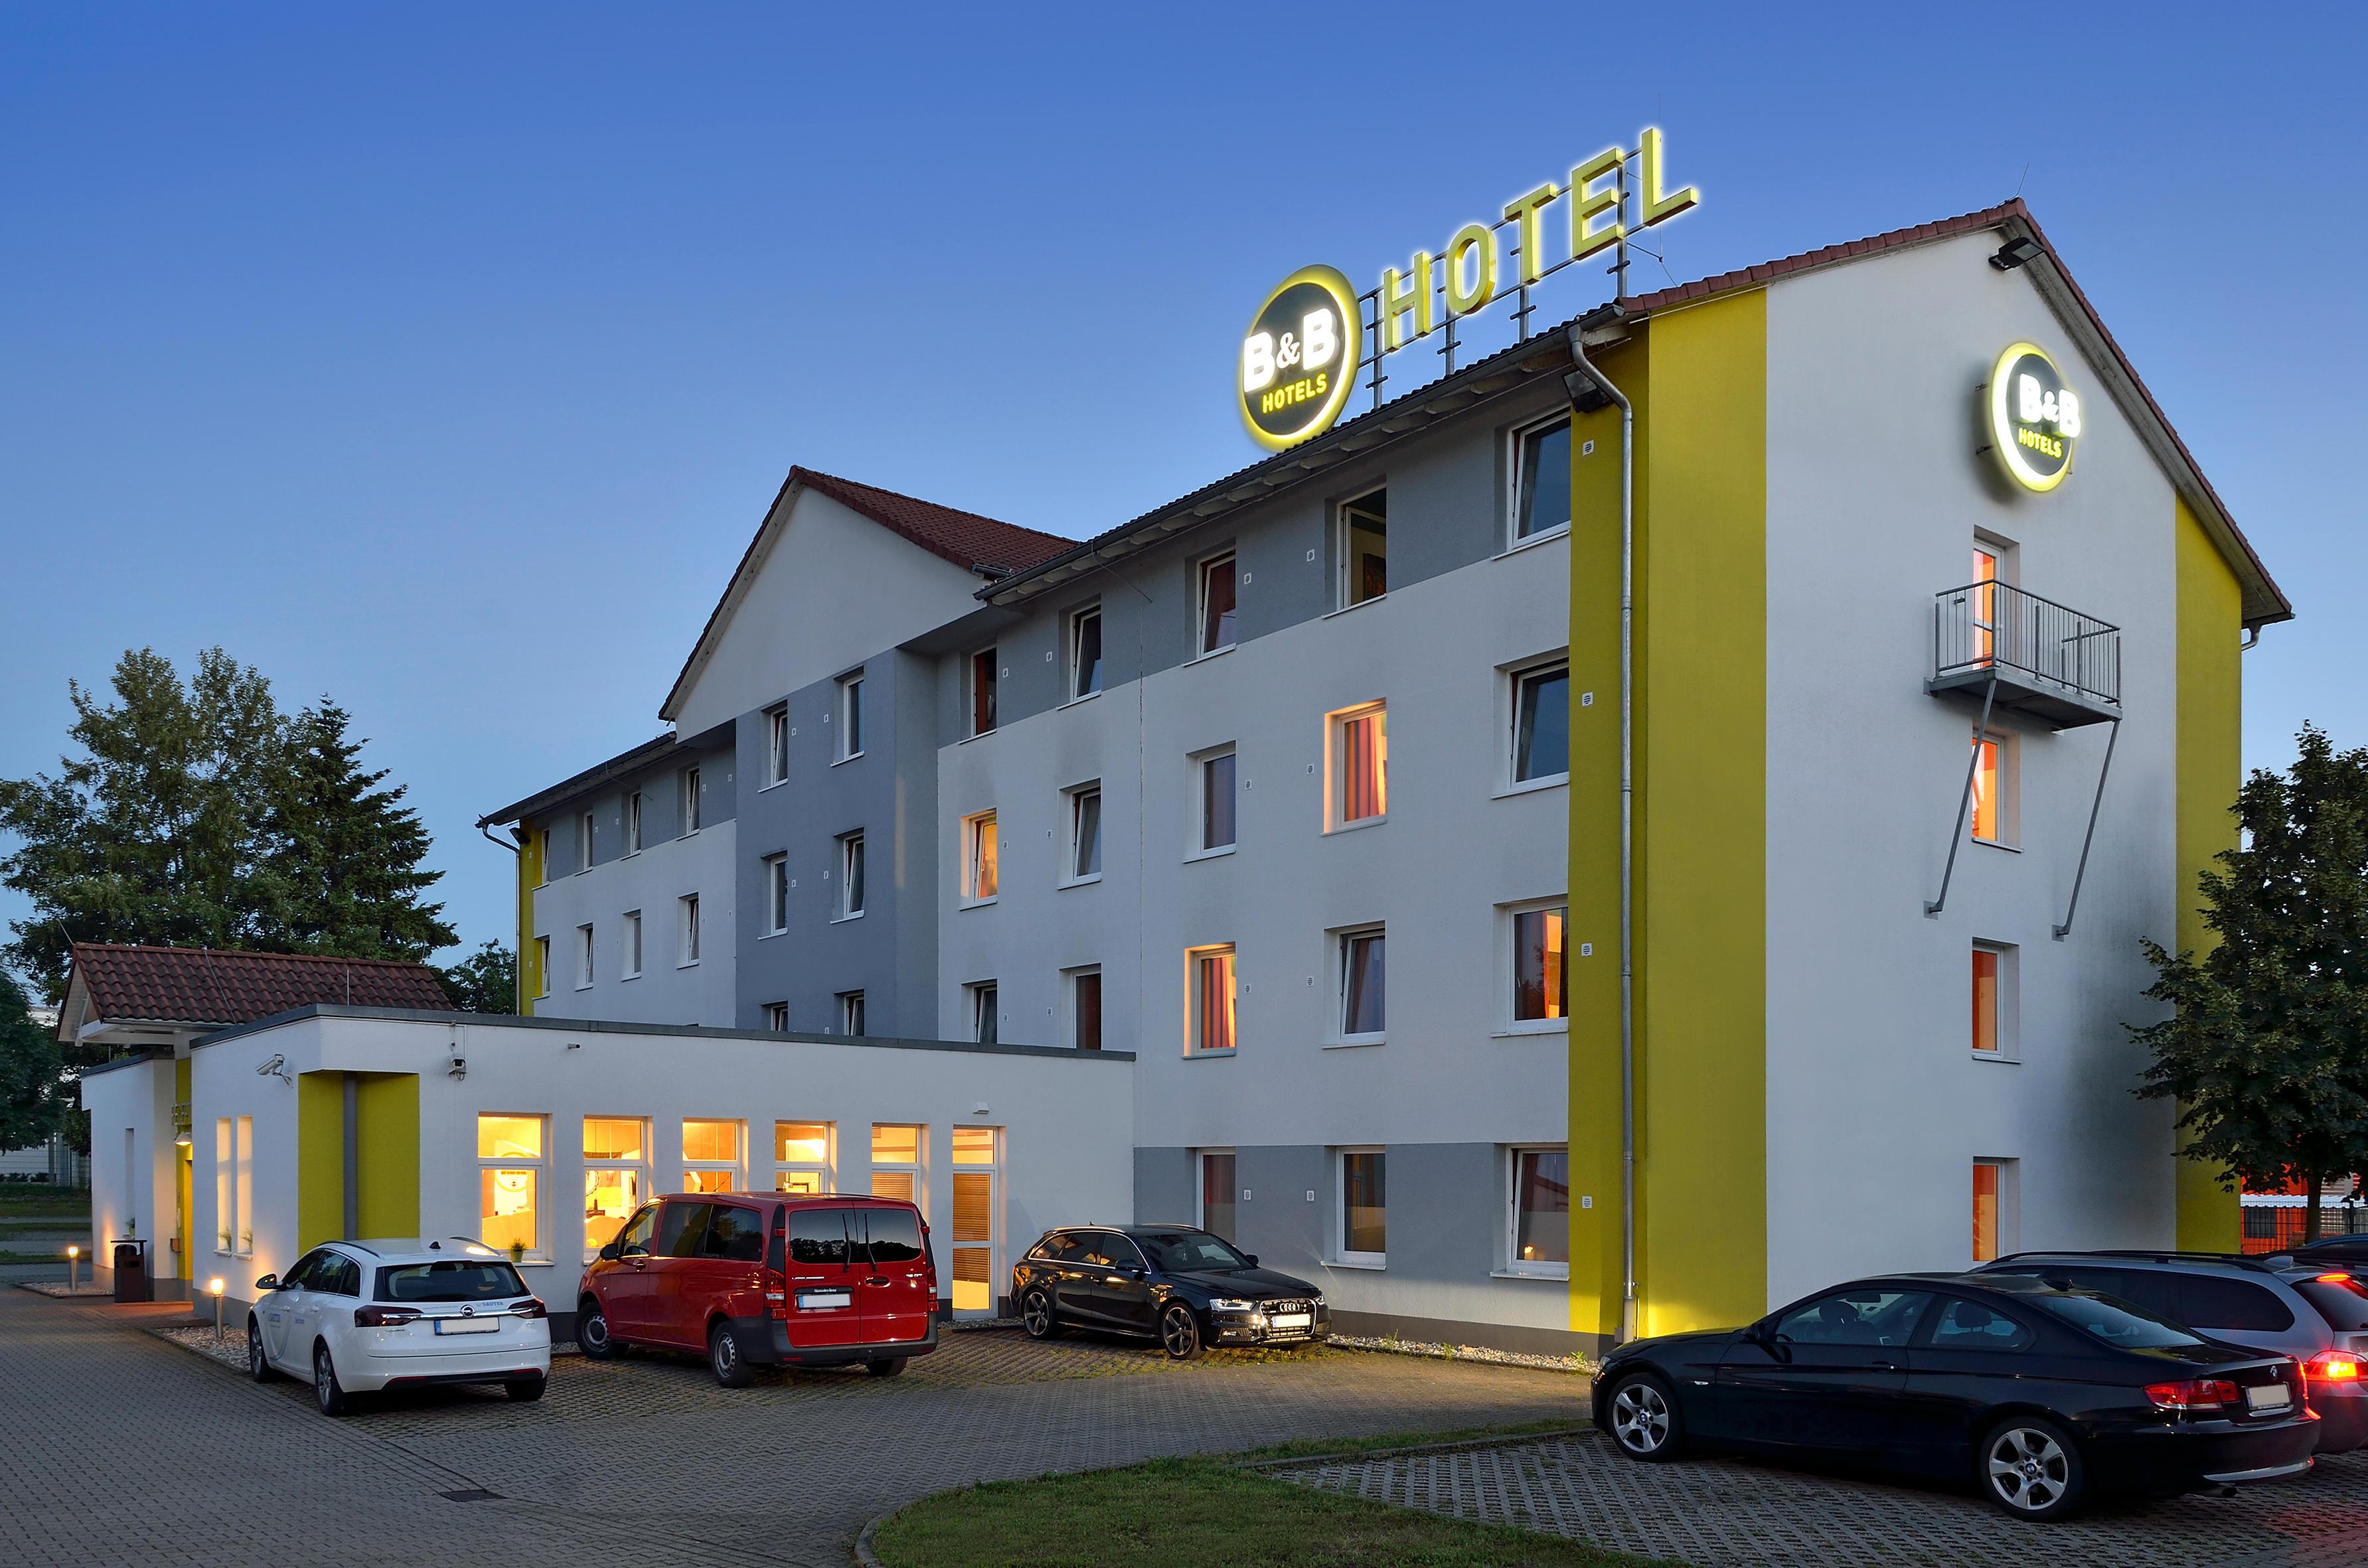 b b hotel freiburg nord hotel in freiburg tullastra e 87c. Black Bedroom Furniture Sets. Home Design Ideas